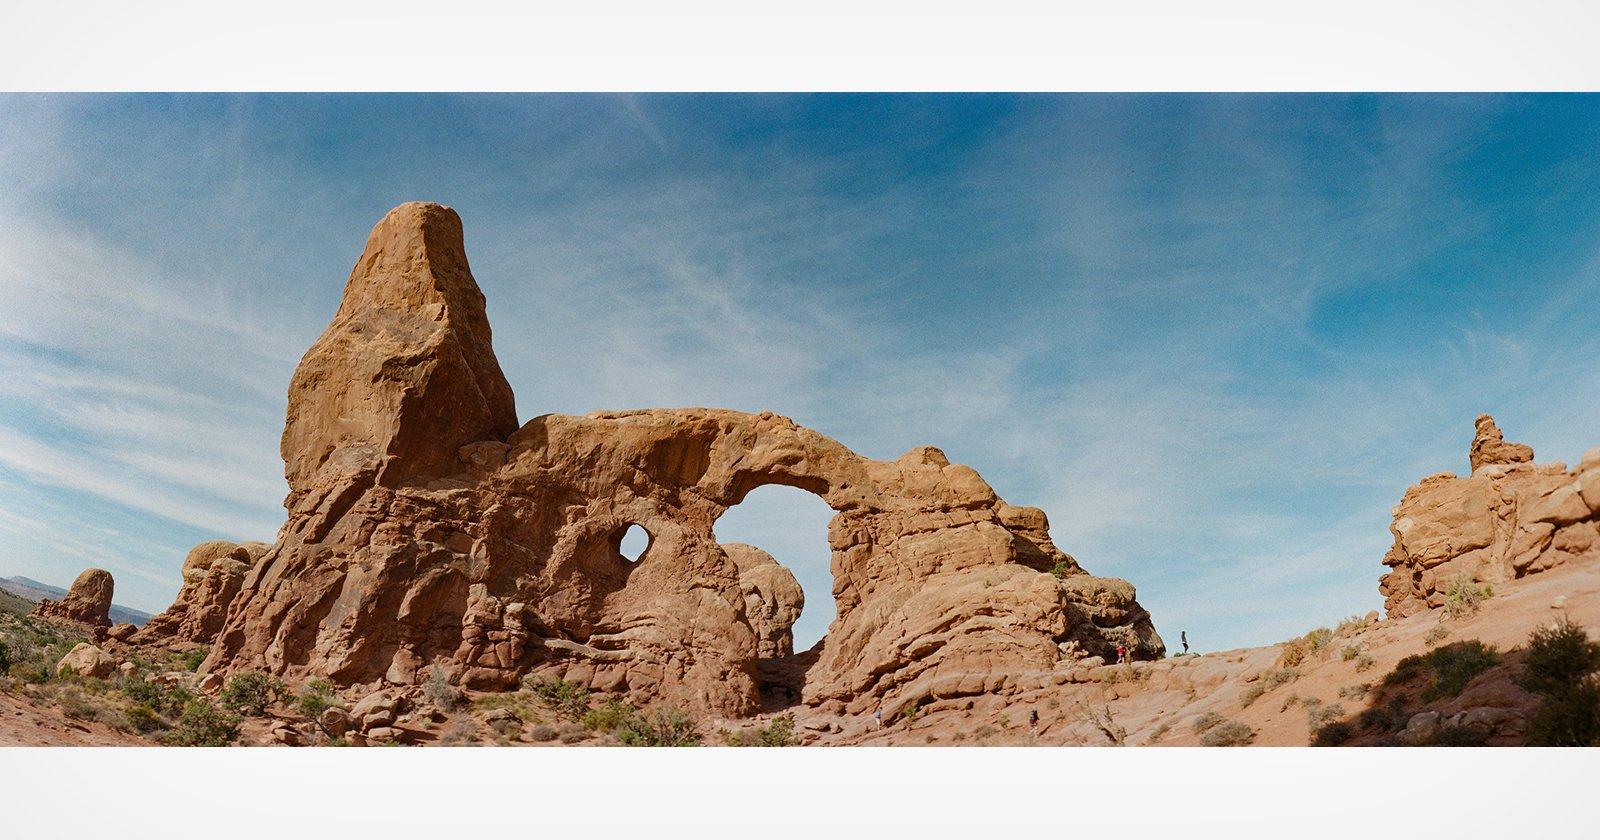 Ripresa di paesaggi con la fotocamera panoramica Horizon 202